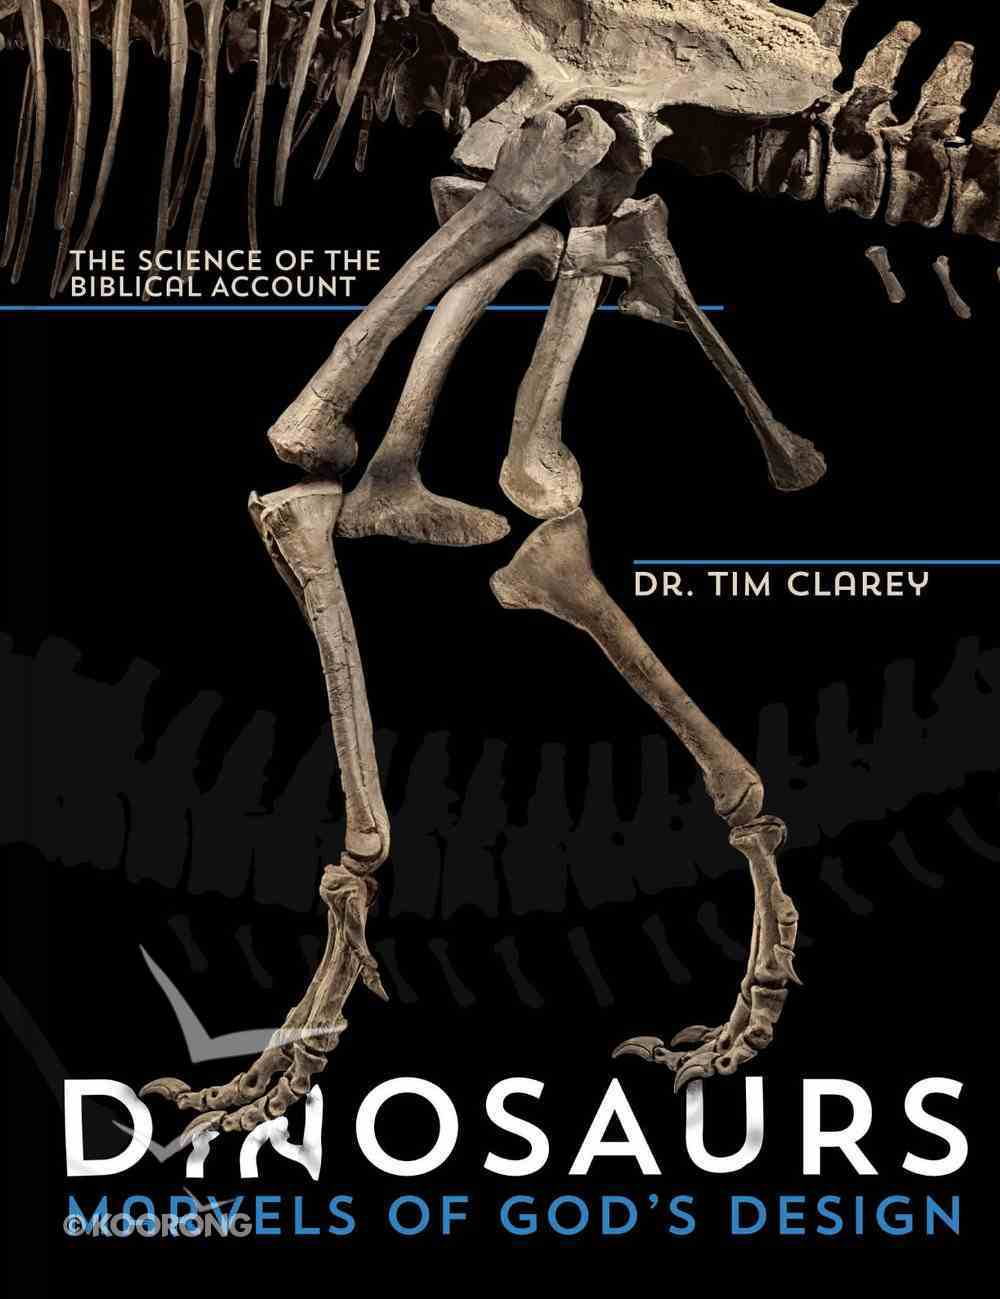 Dinosaurs: Marvels of God's Design Hardback